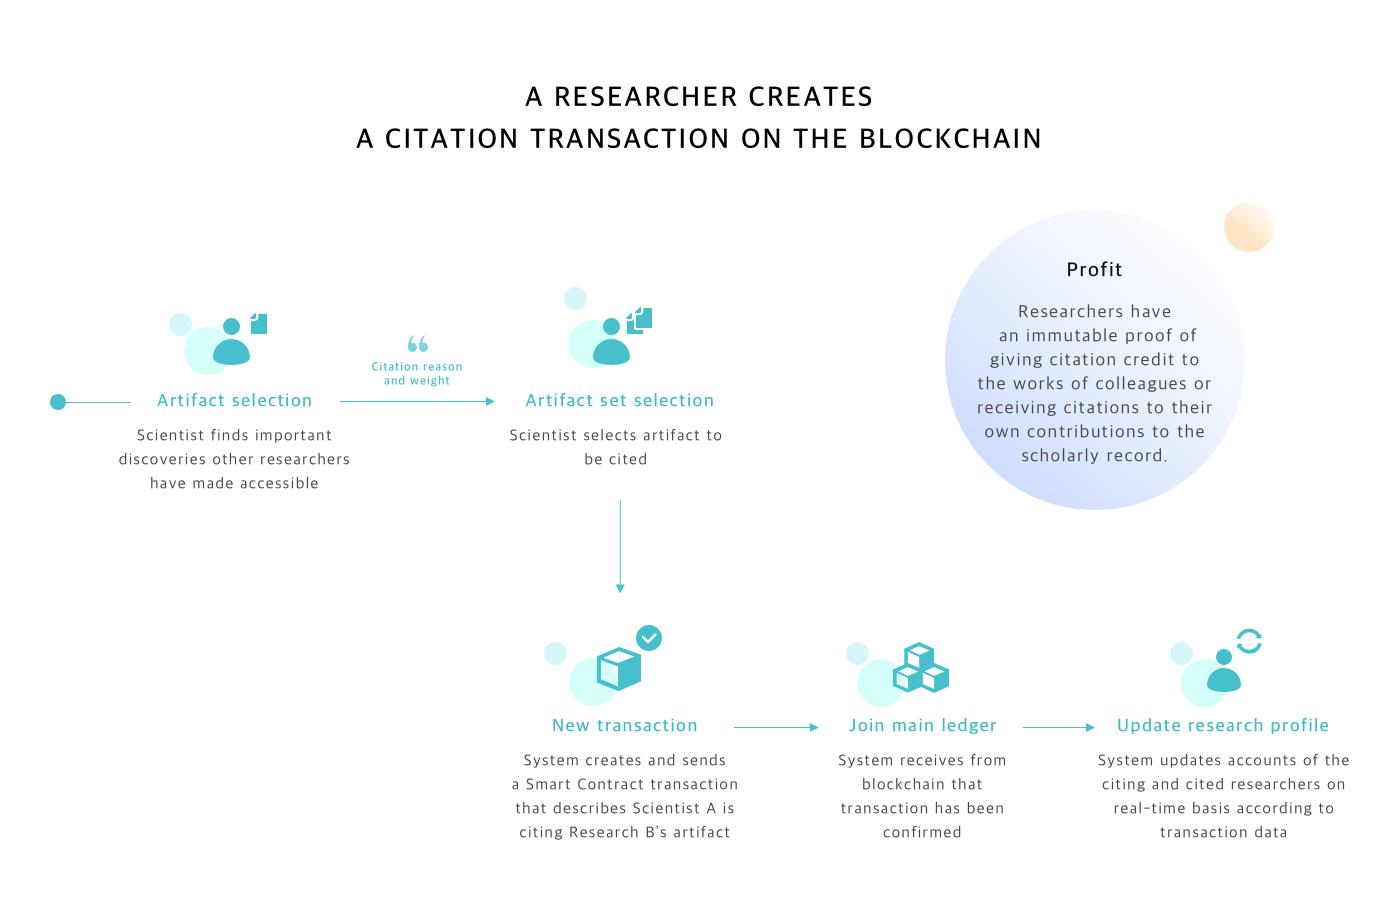 ARTiFACTS: a secure blockchain platform for scientific research